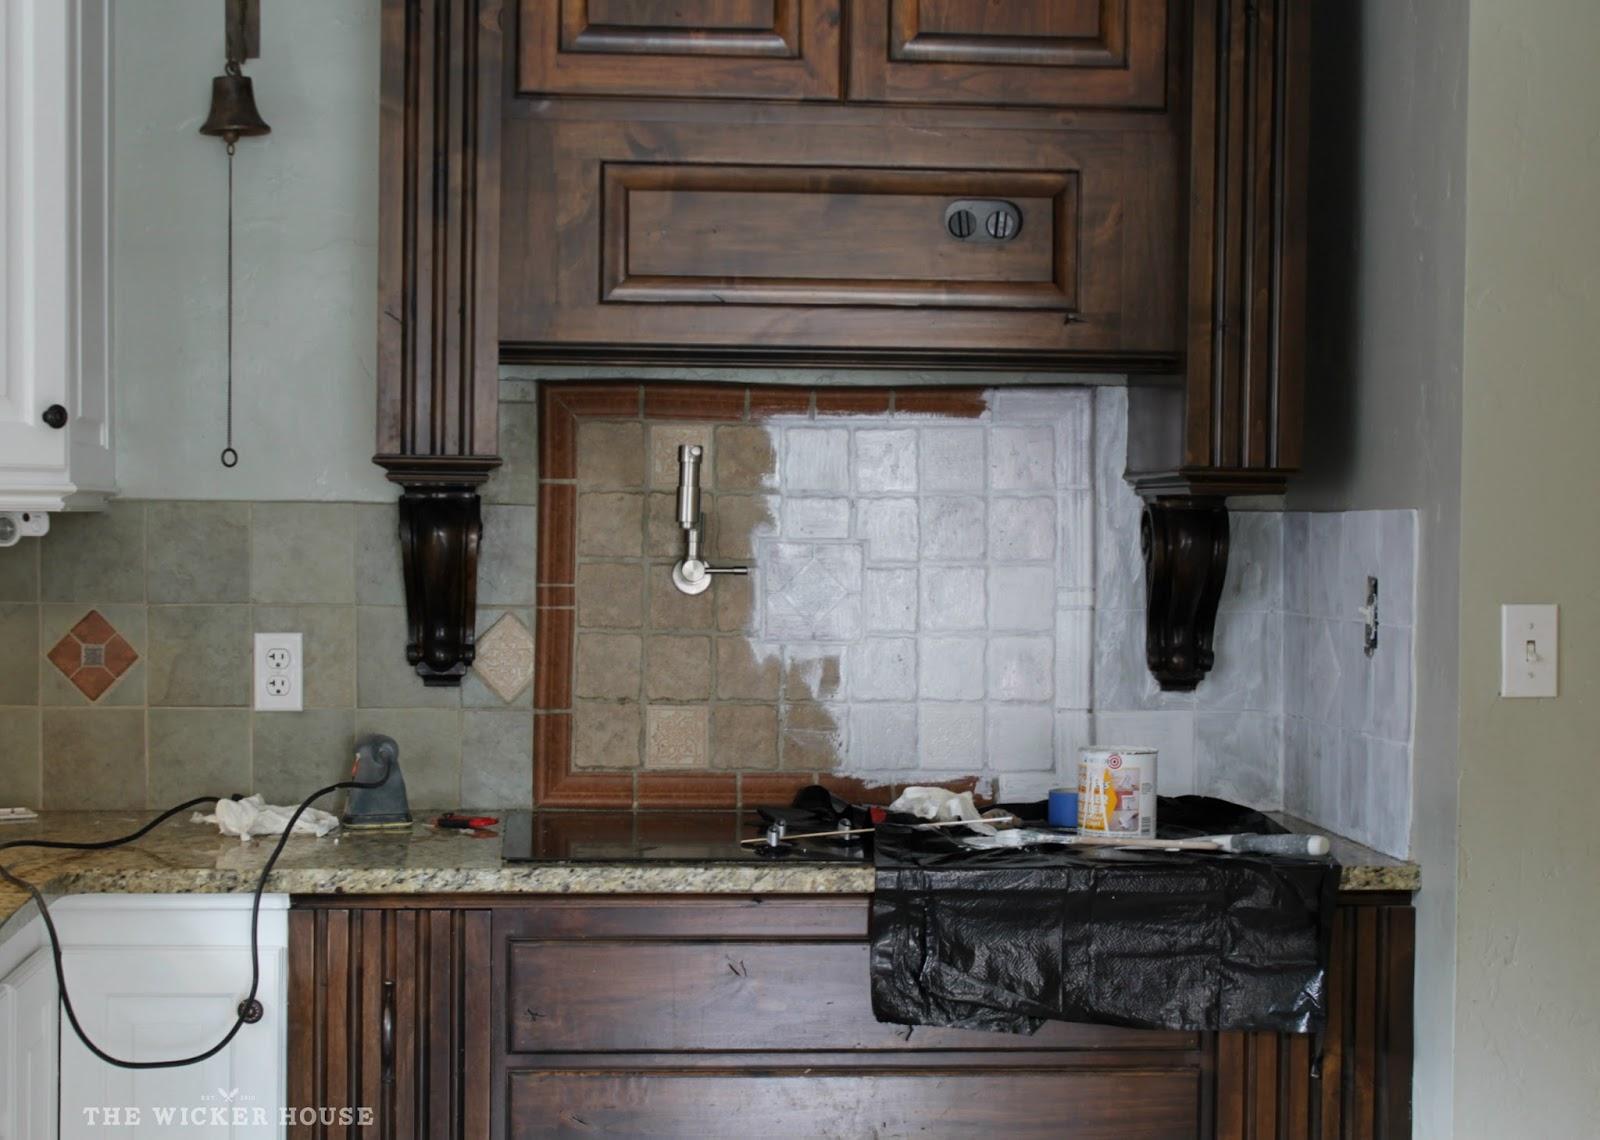 Painting Kitchen Tiles: I Painted Our Kitchen Tile Backsplash!!